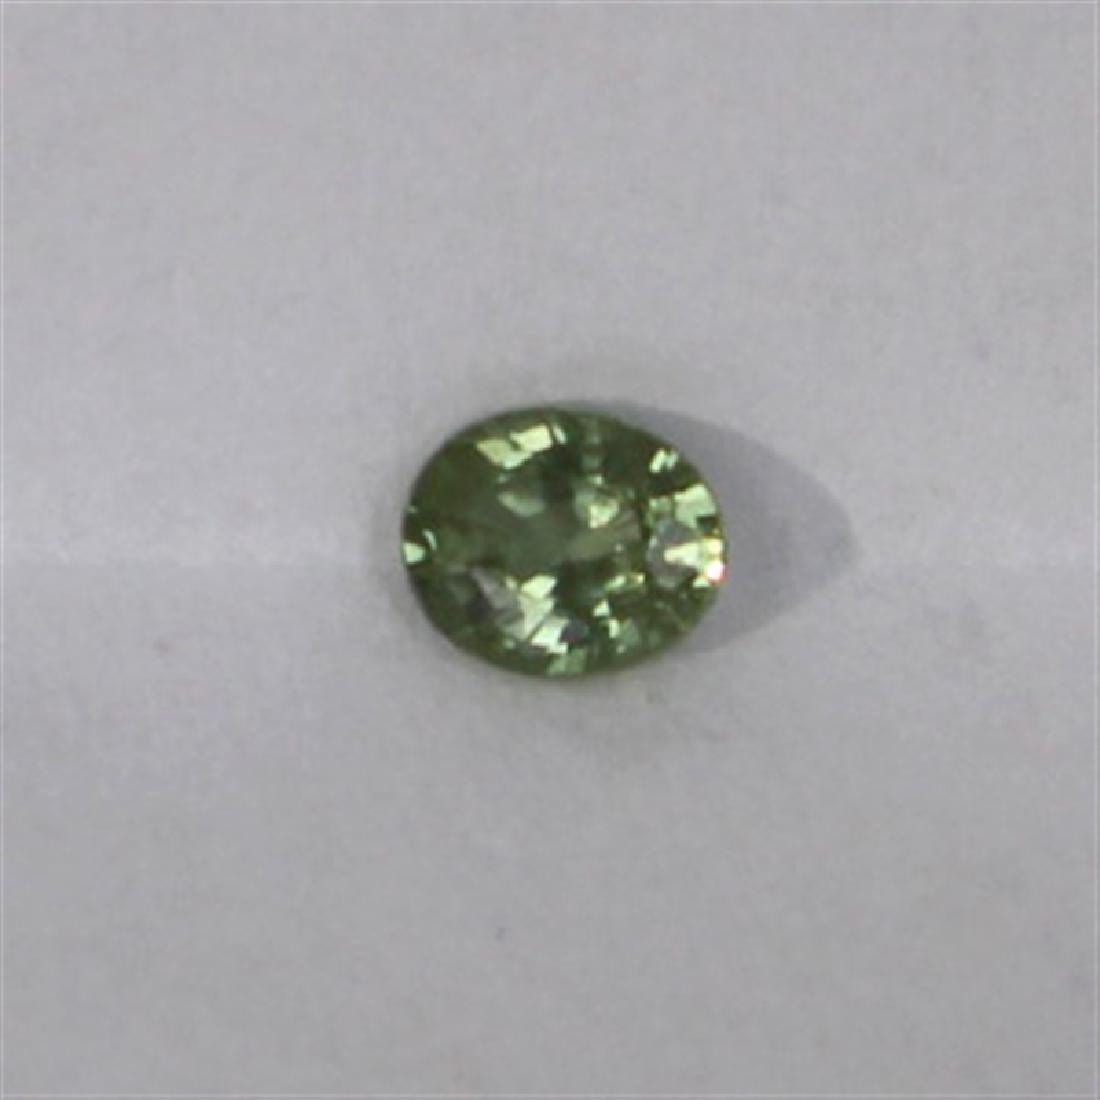 0.42ct Alexandrite oval cut